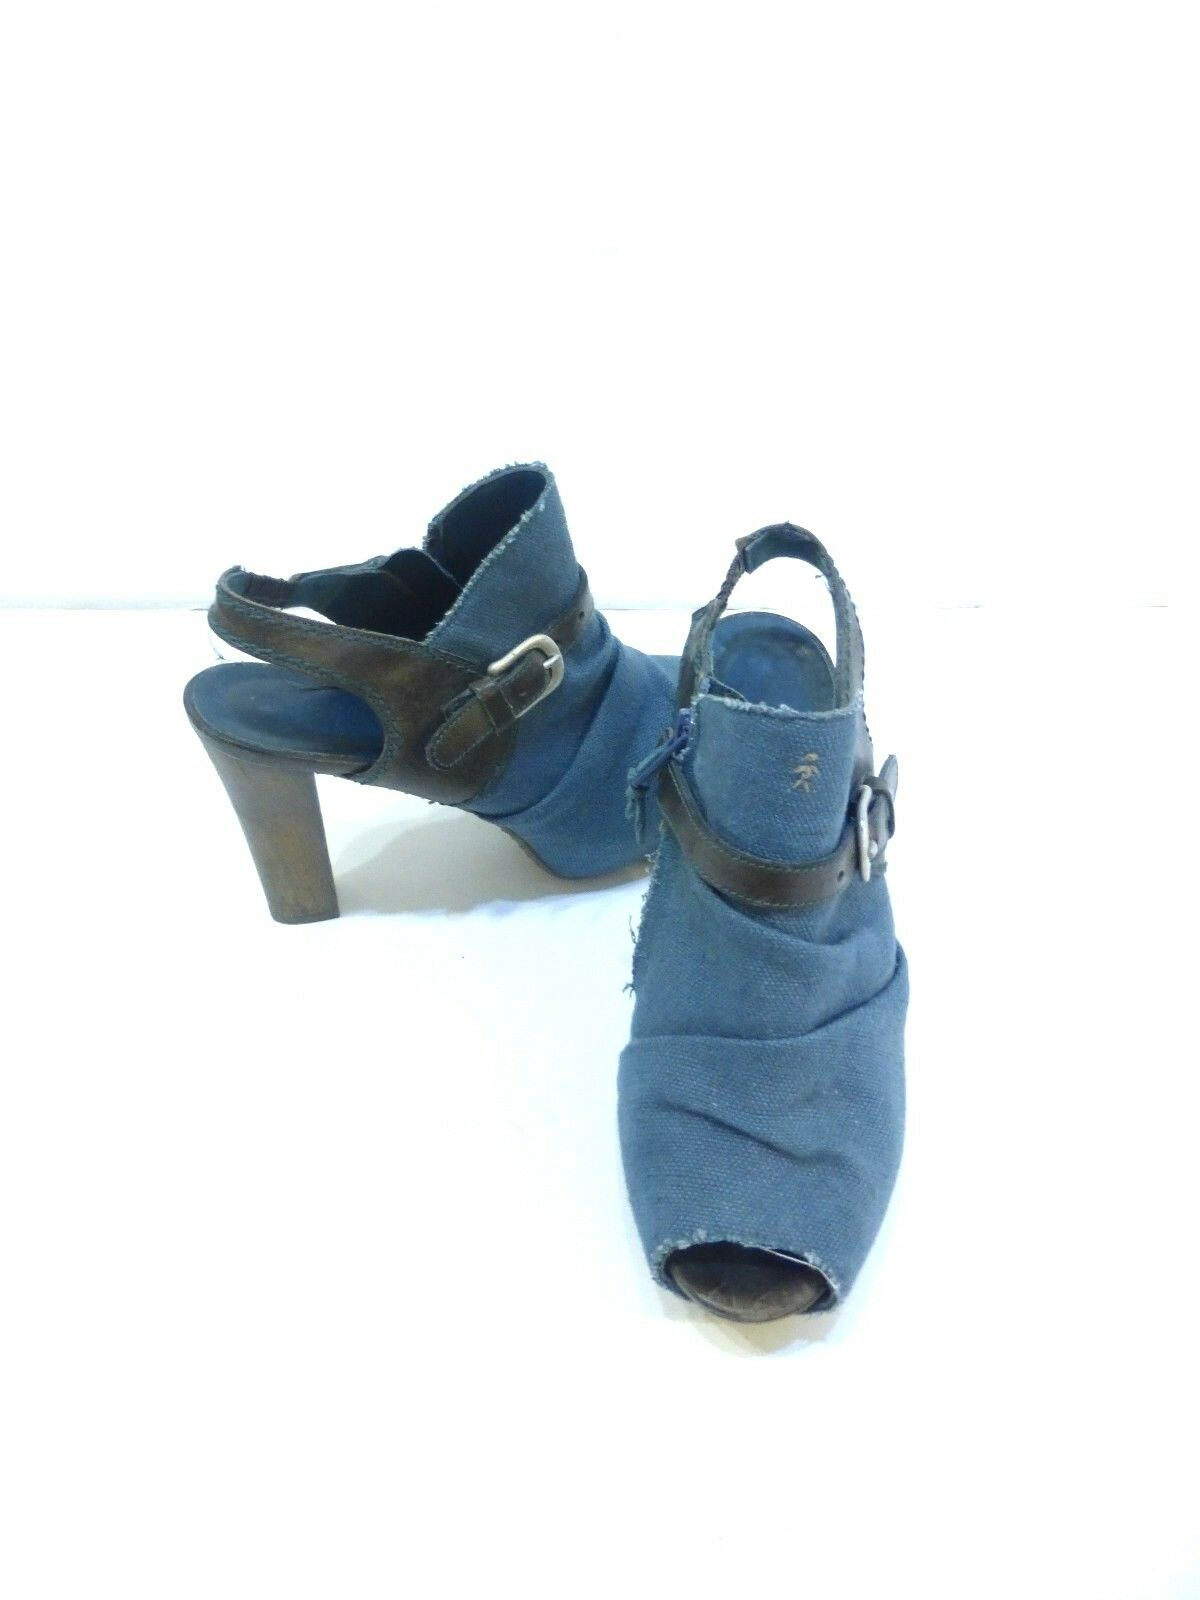 Henry Beguelin Blue Denim Slingback Booties Sandals sz 6 Euro 36